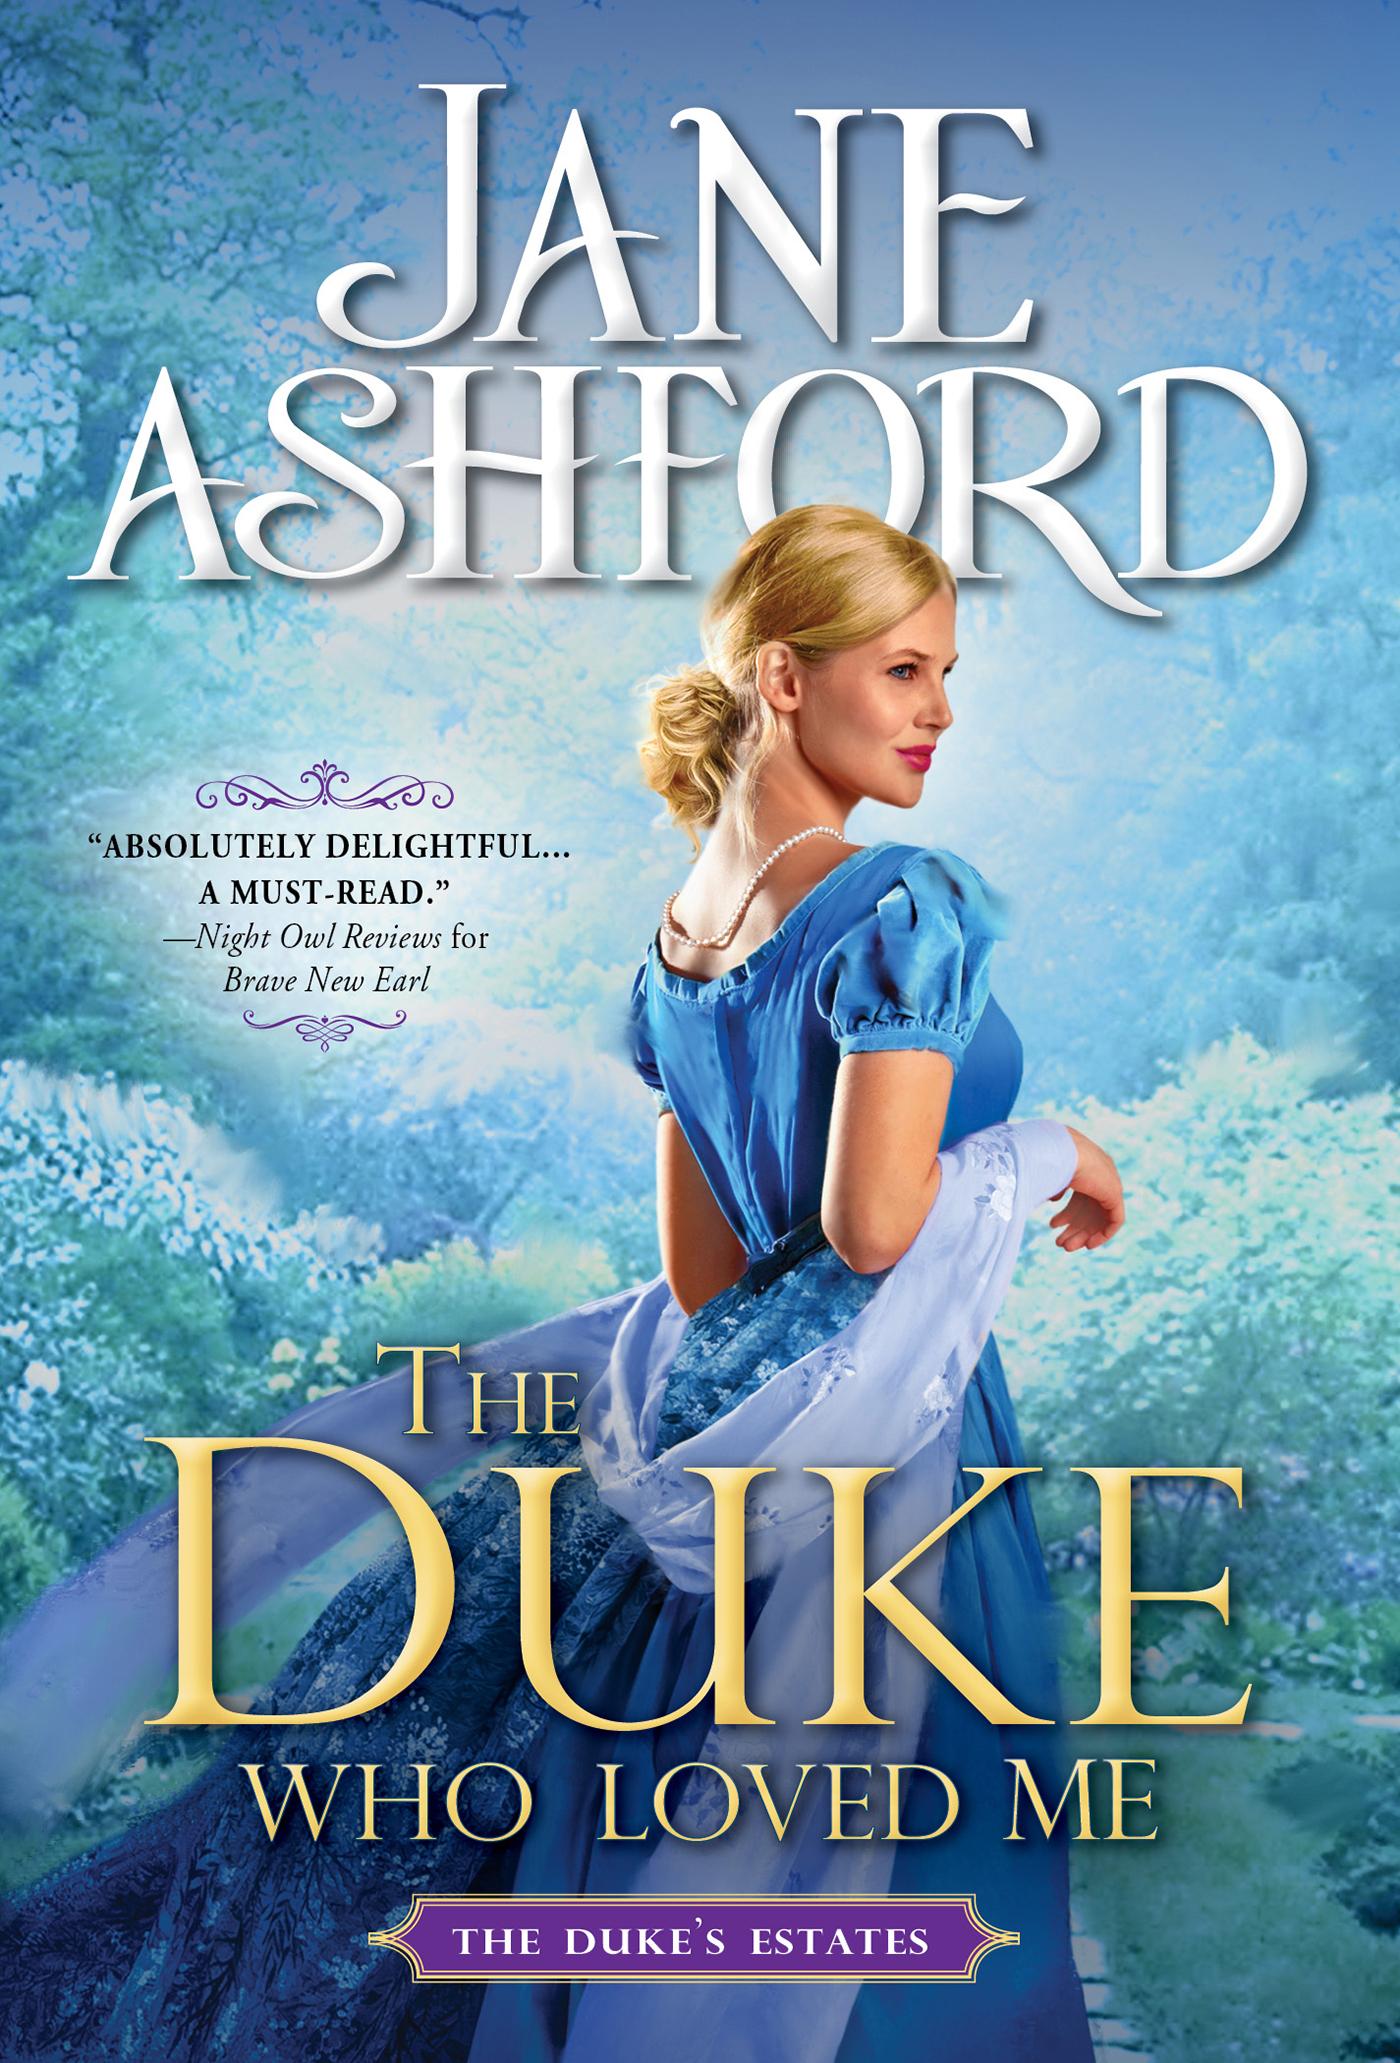 The Duke Who Loved Me